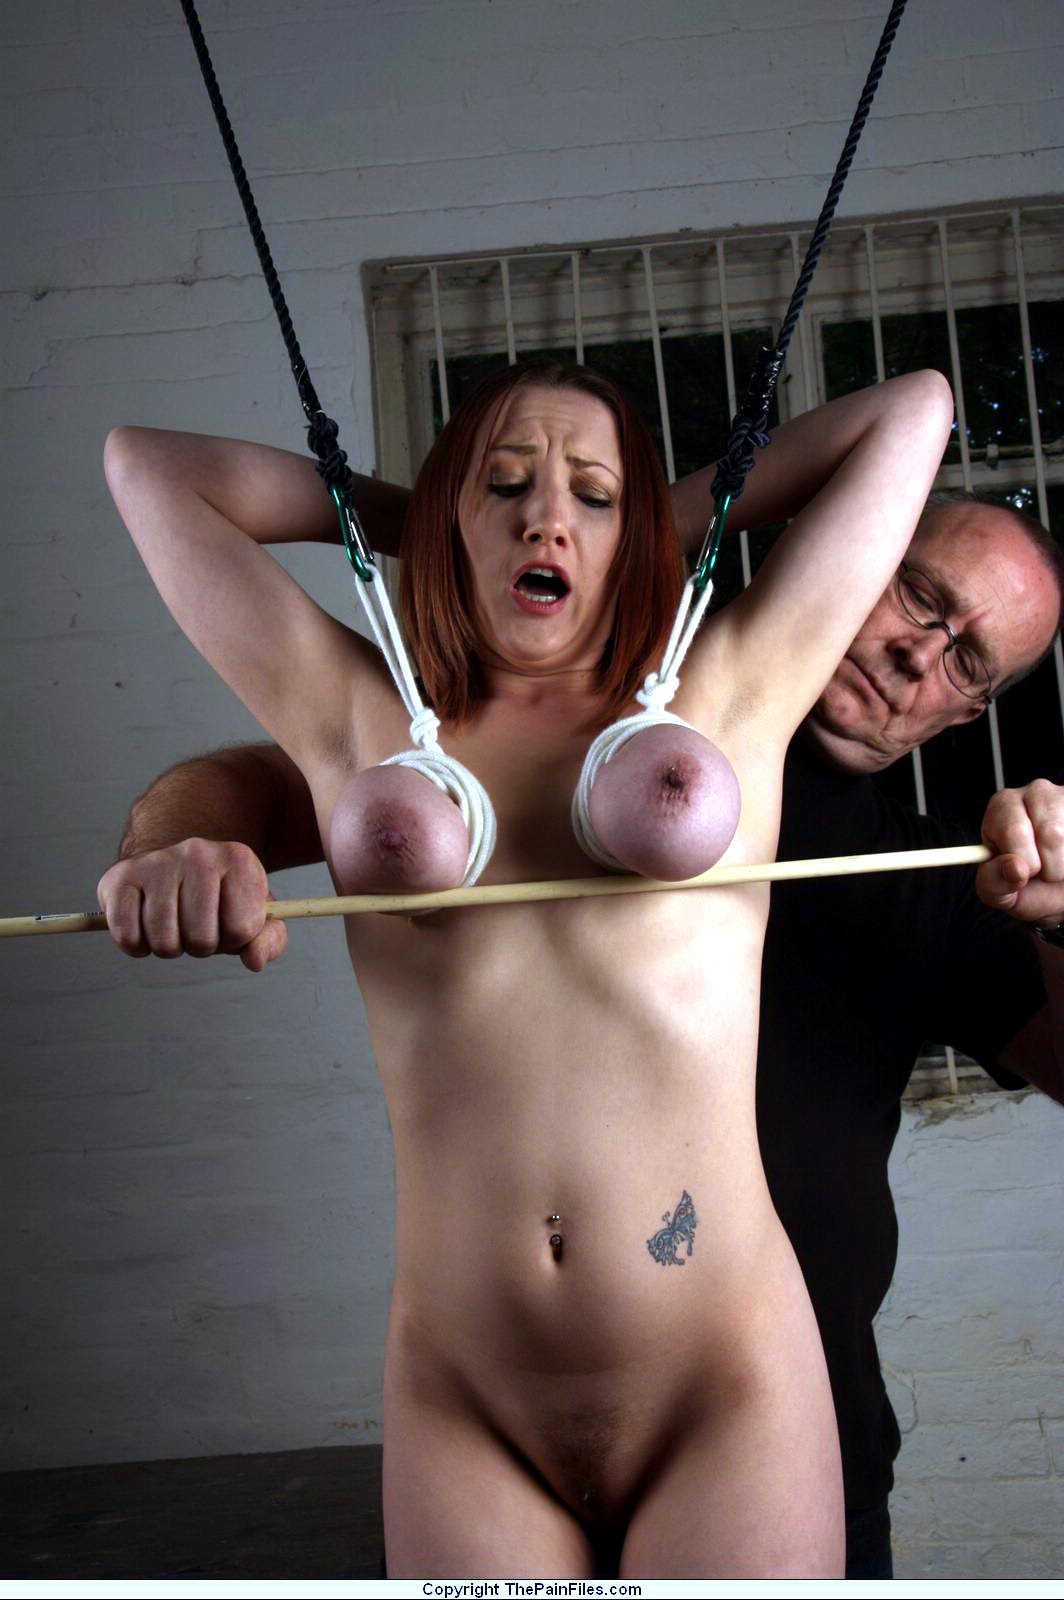 Ass. Very boobs nipples bondage